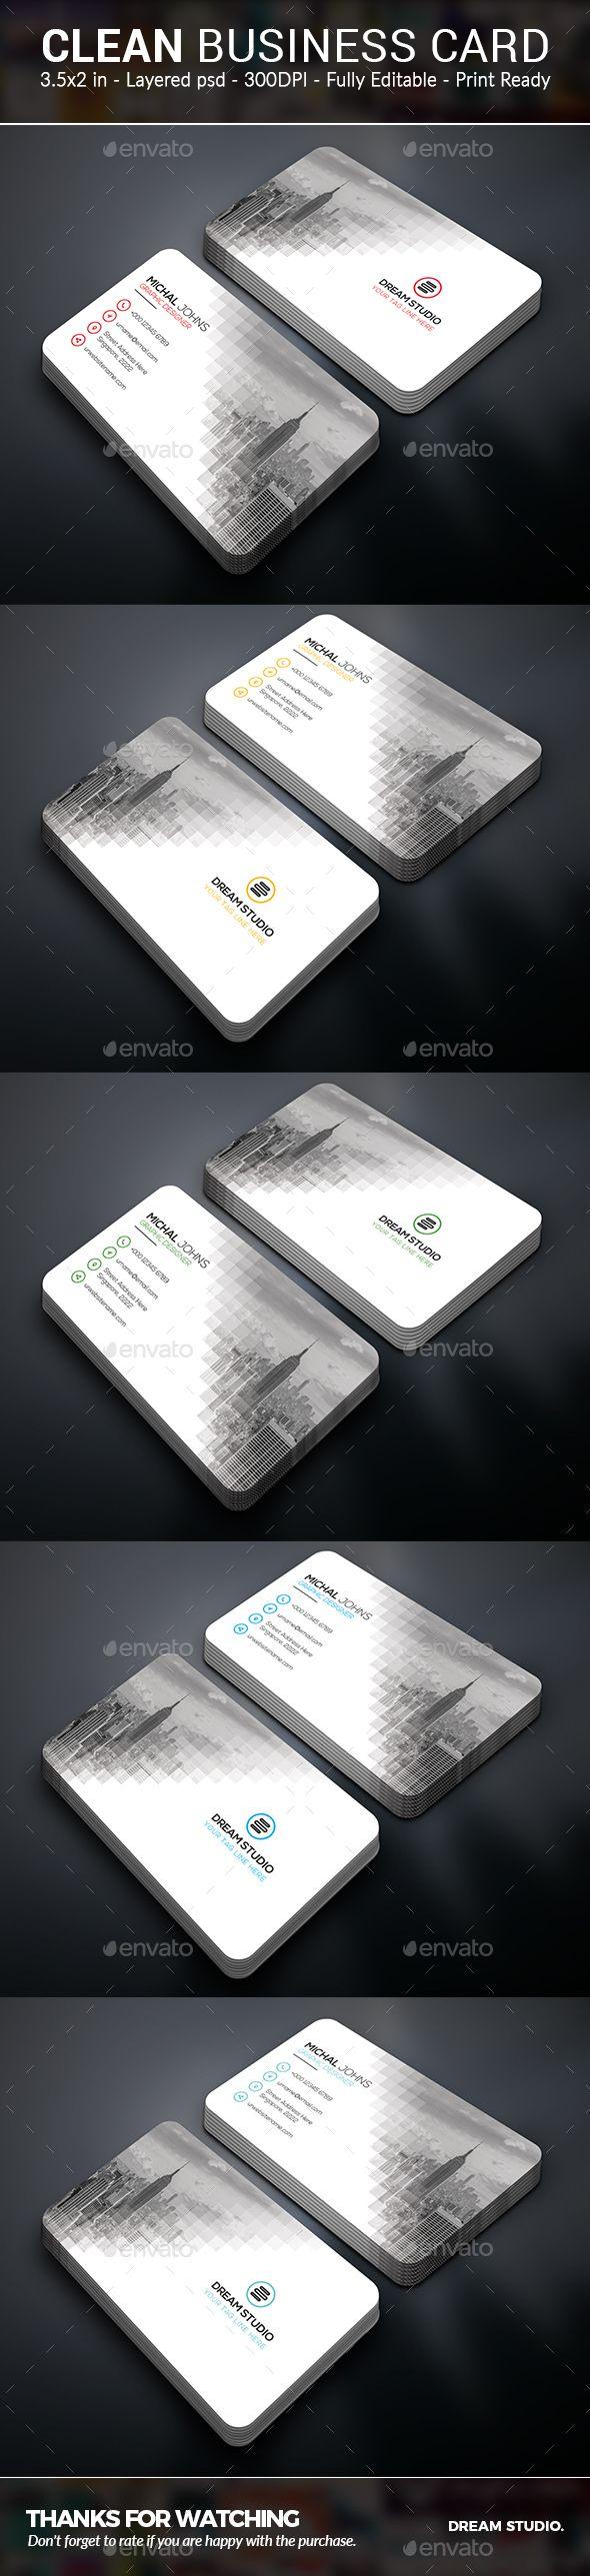 935 best business card images on pinterest business cards font business cards magicingreecefo Choice Image